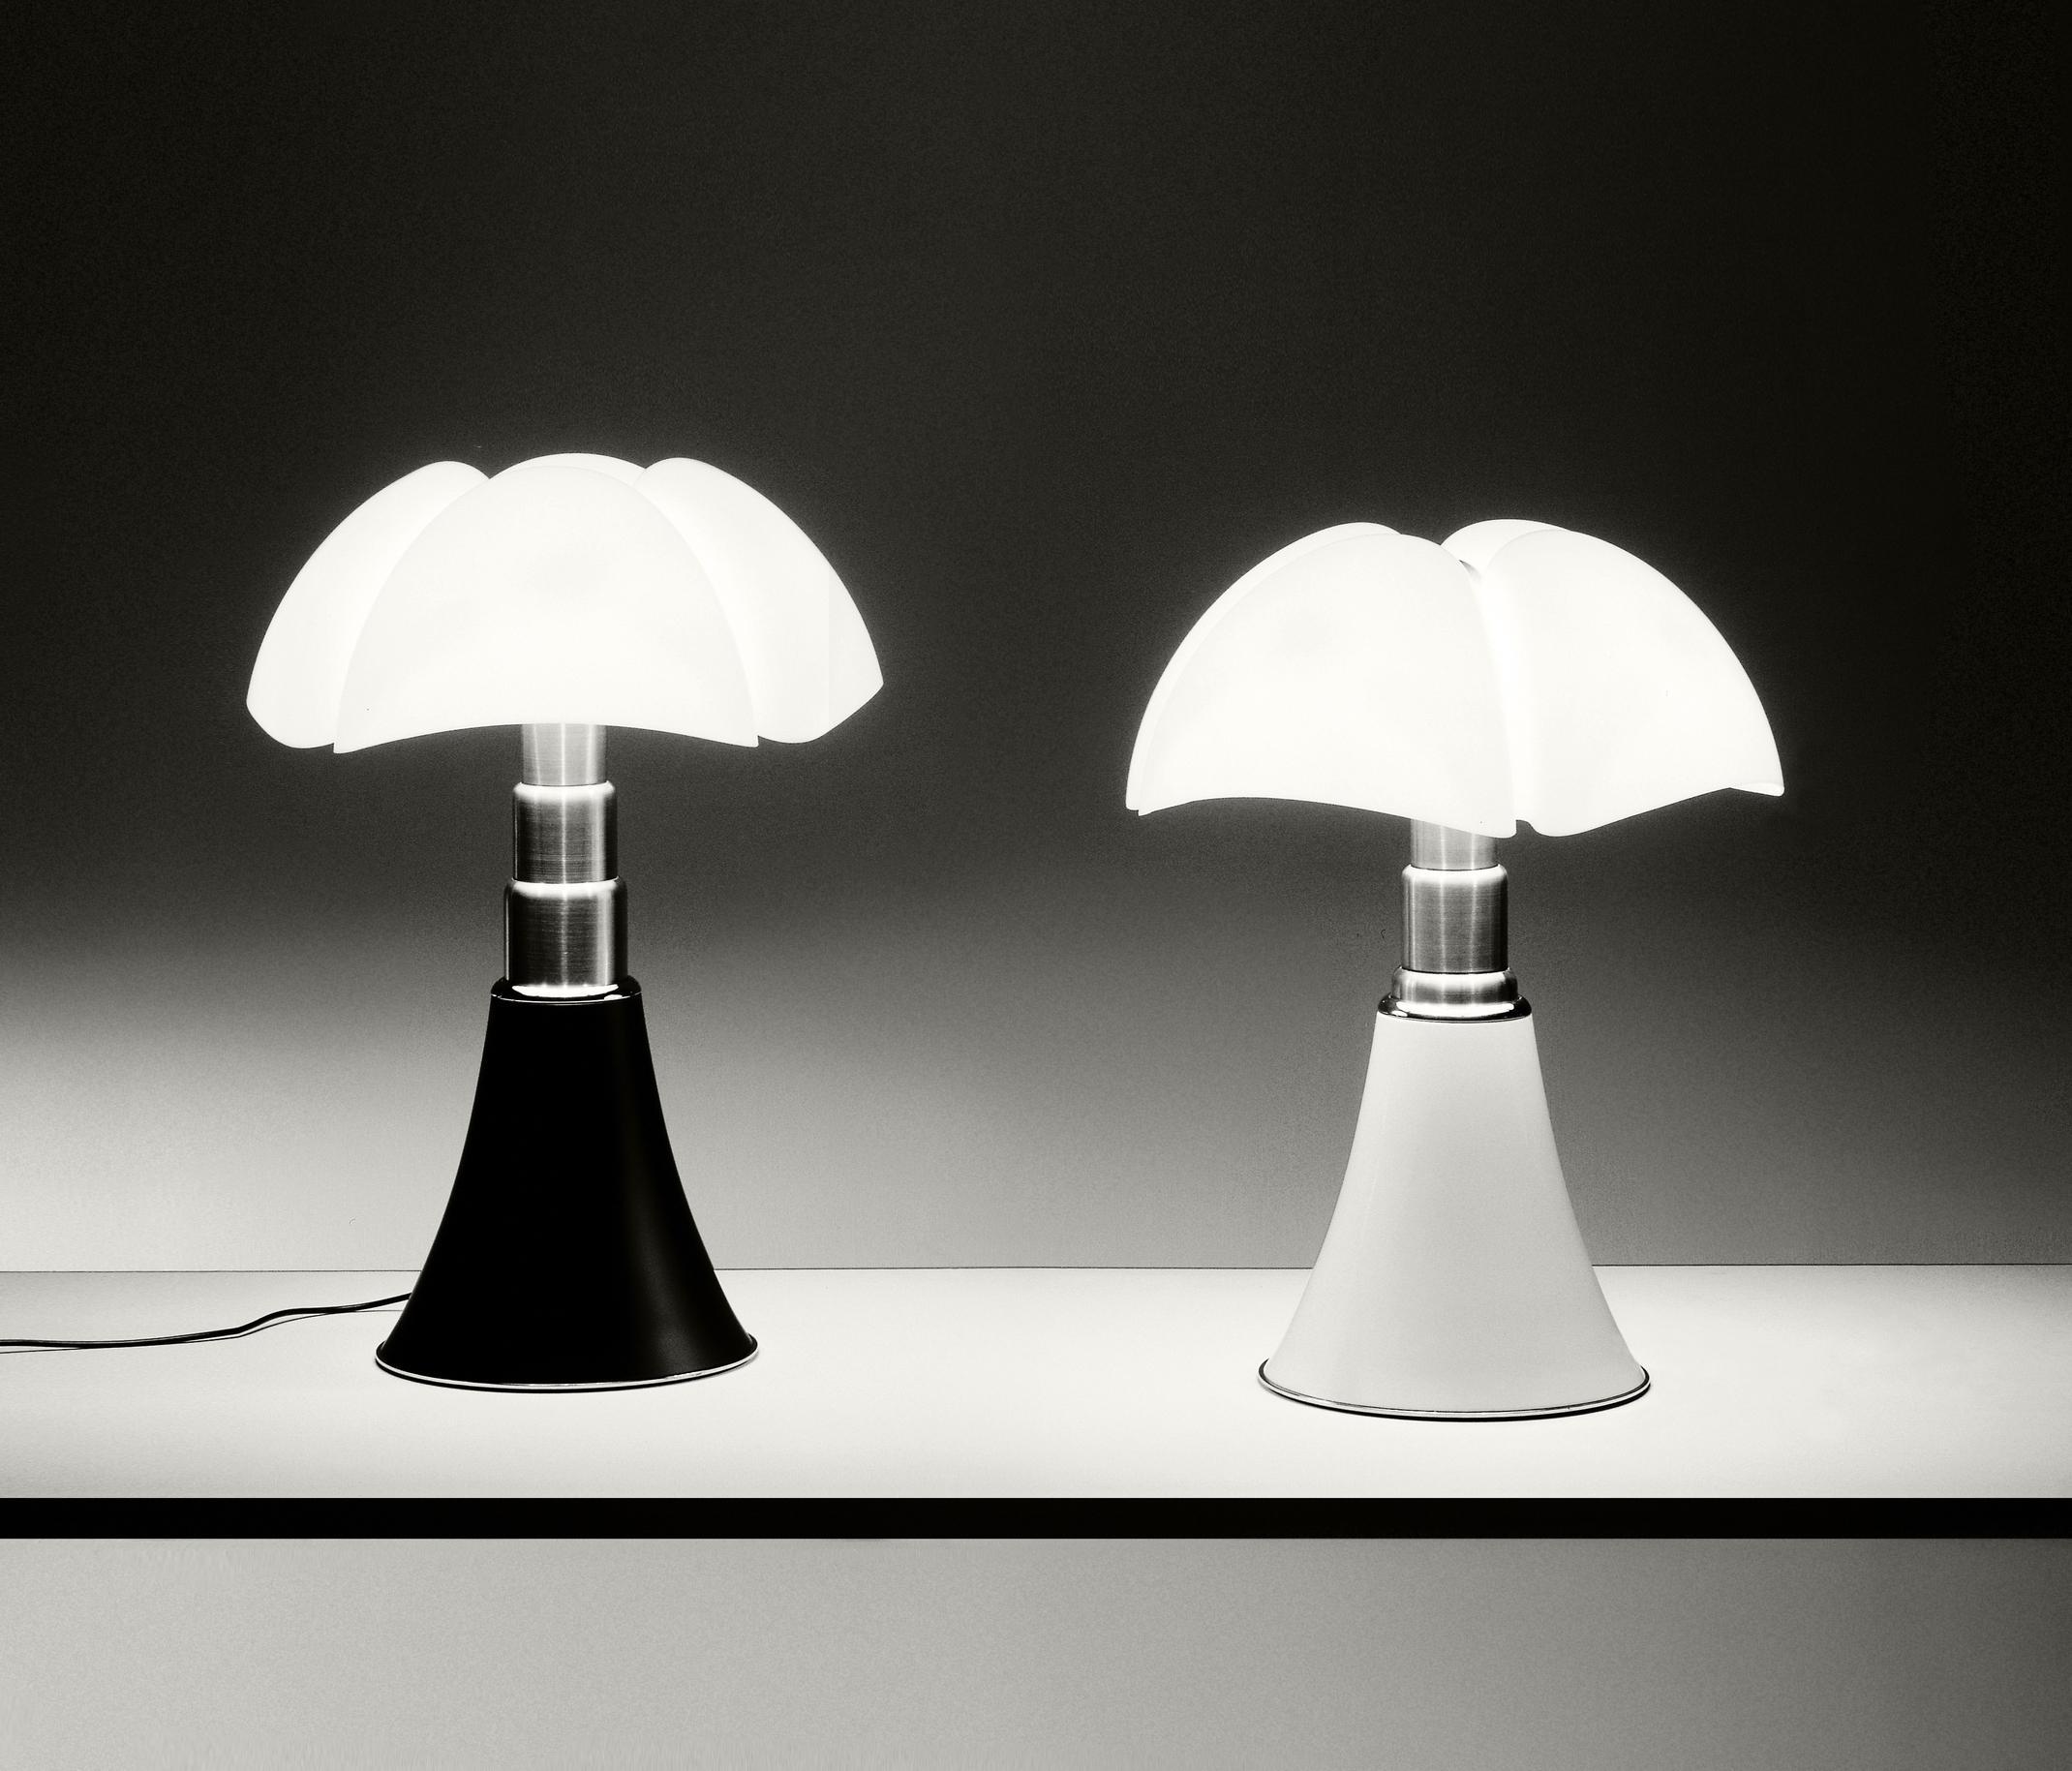 pipistrello led general lighting from martinelli luce. Black Bedroom Furniture Sets. Home Design Ideas